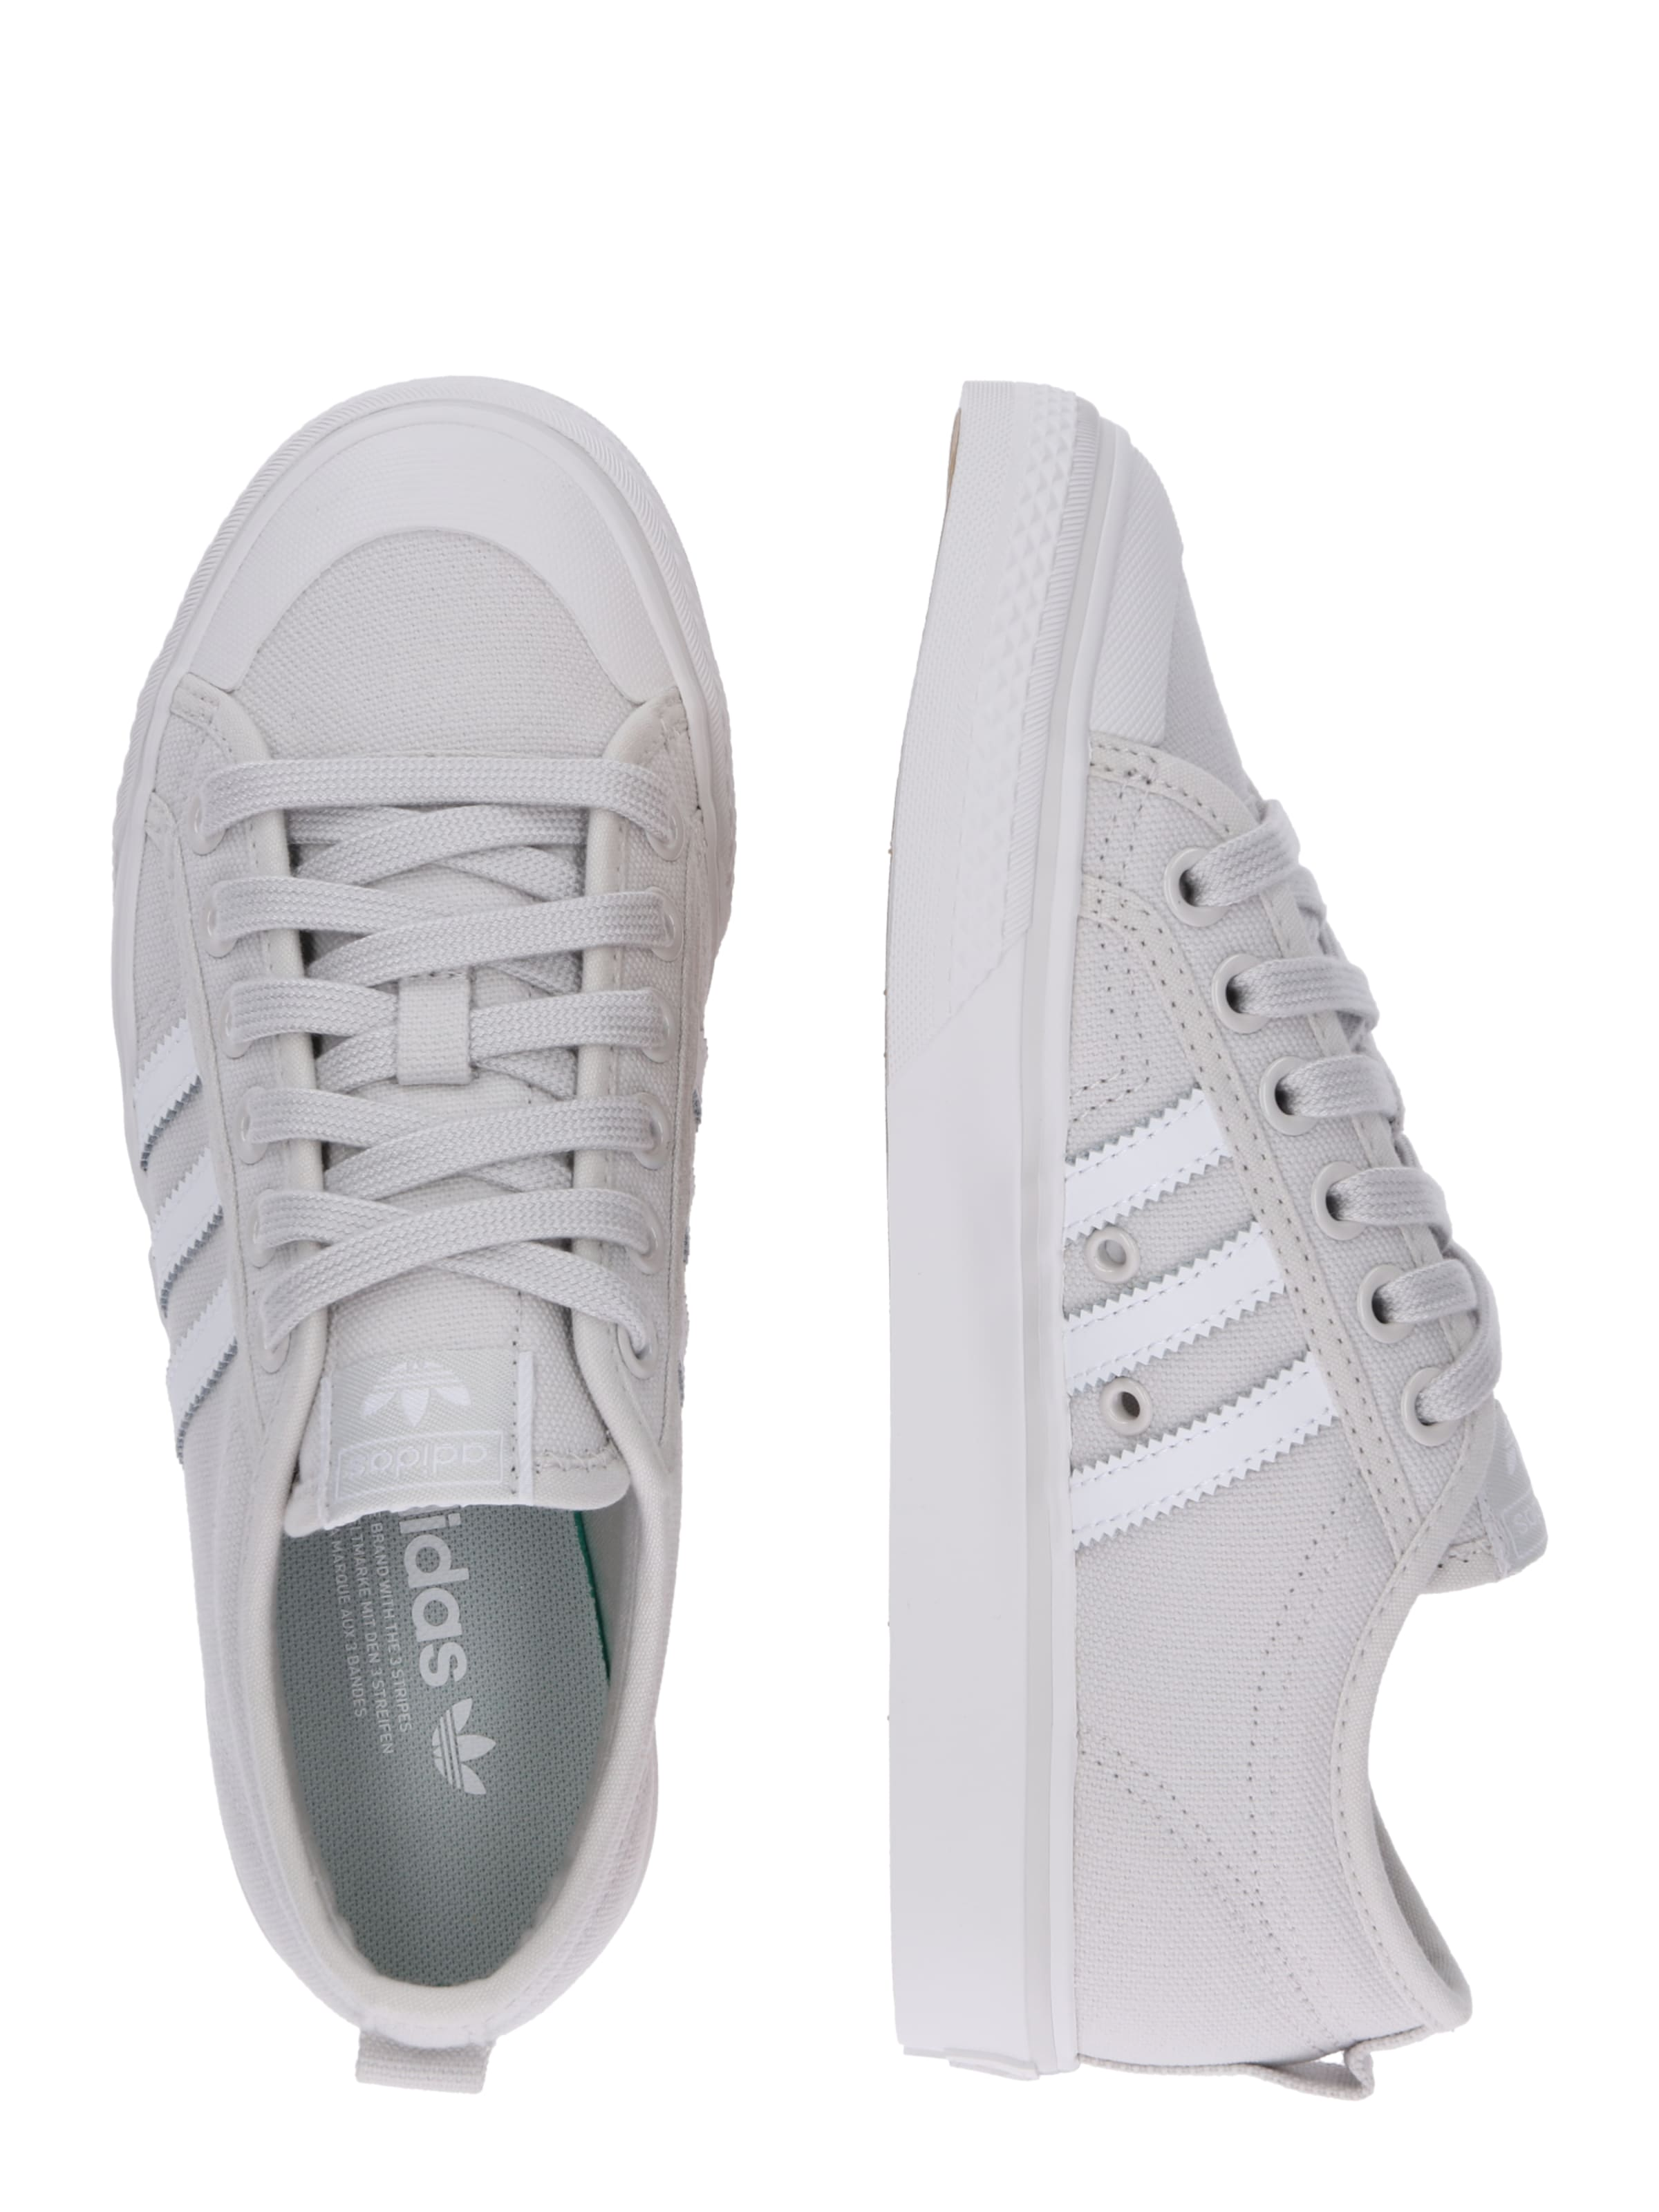 En Baskets Basses Originals 'nizza' Gris Adidas ClairBlanc SVpqUjMLzG